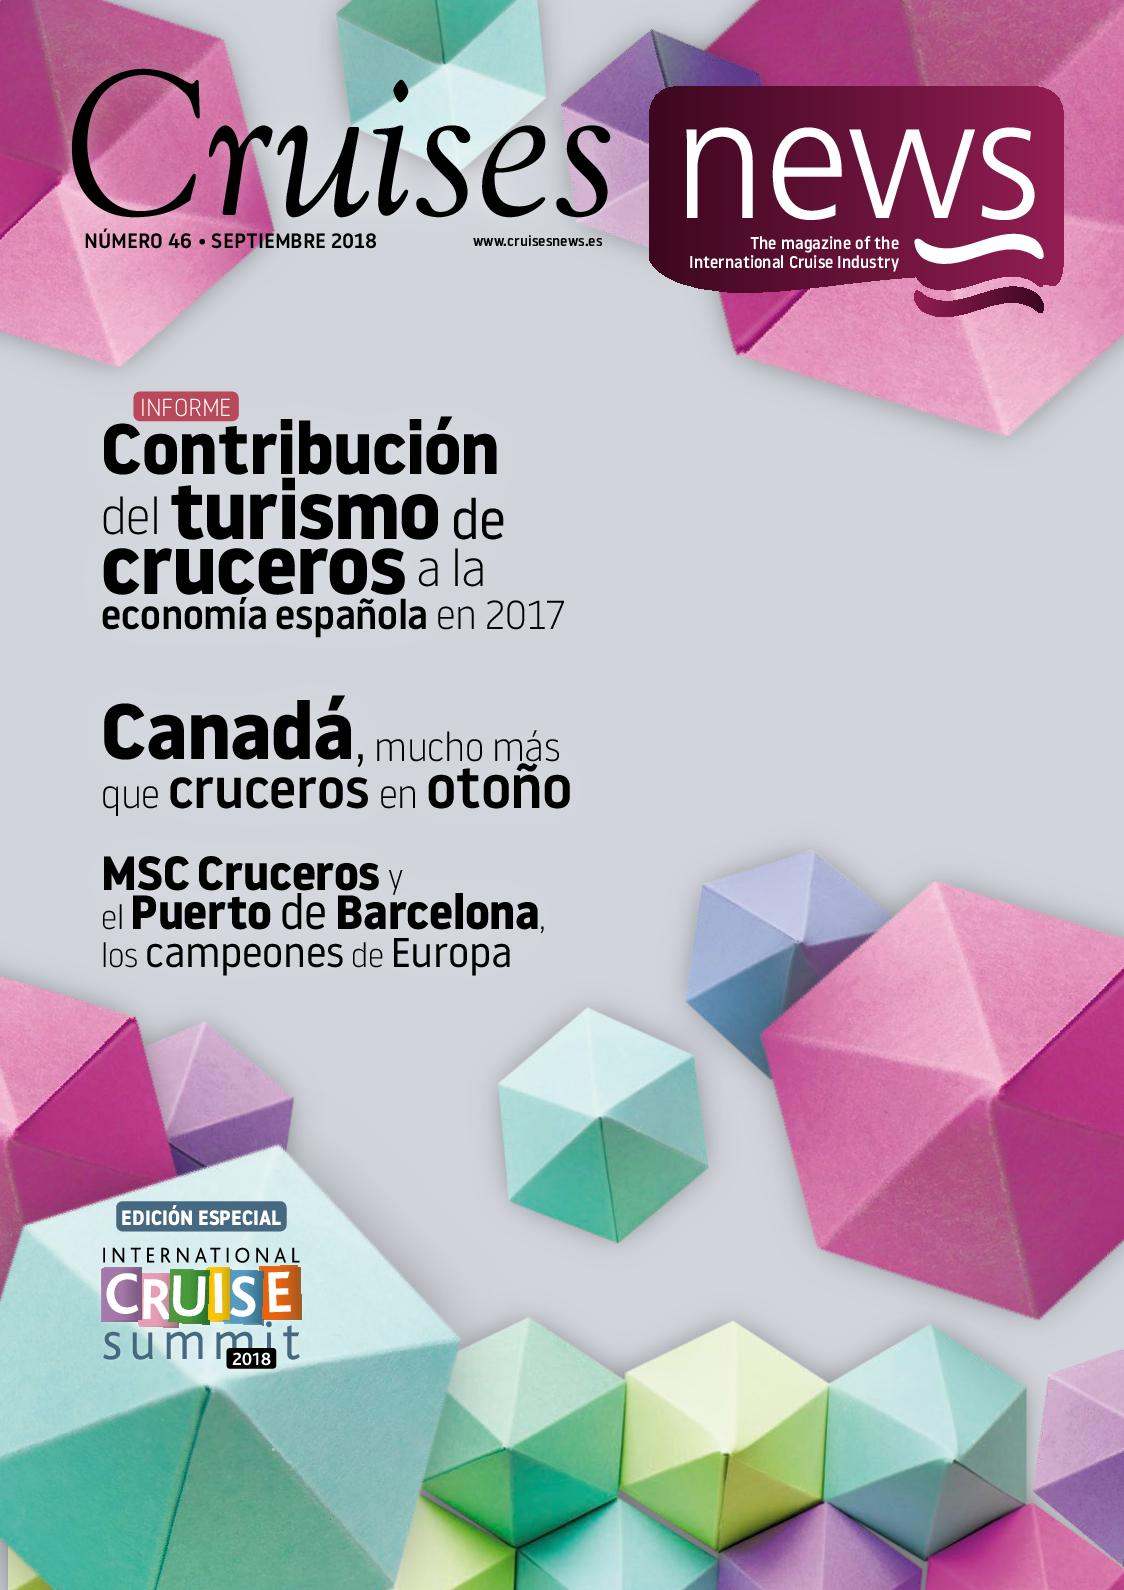 Calaméo - CruisesNews 46 Ed. Esp. ICS 2018